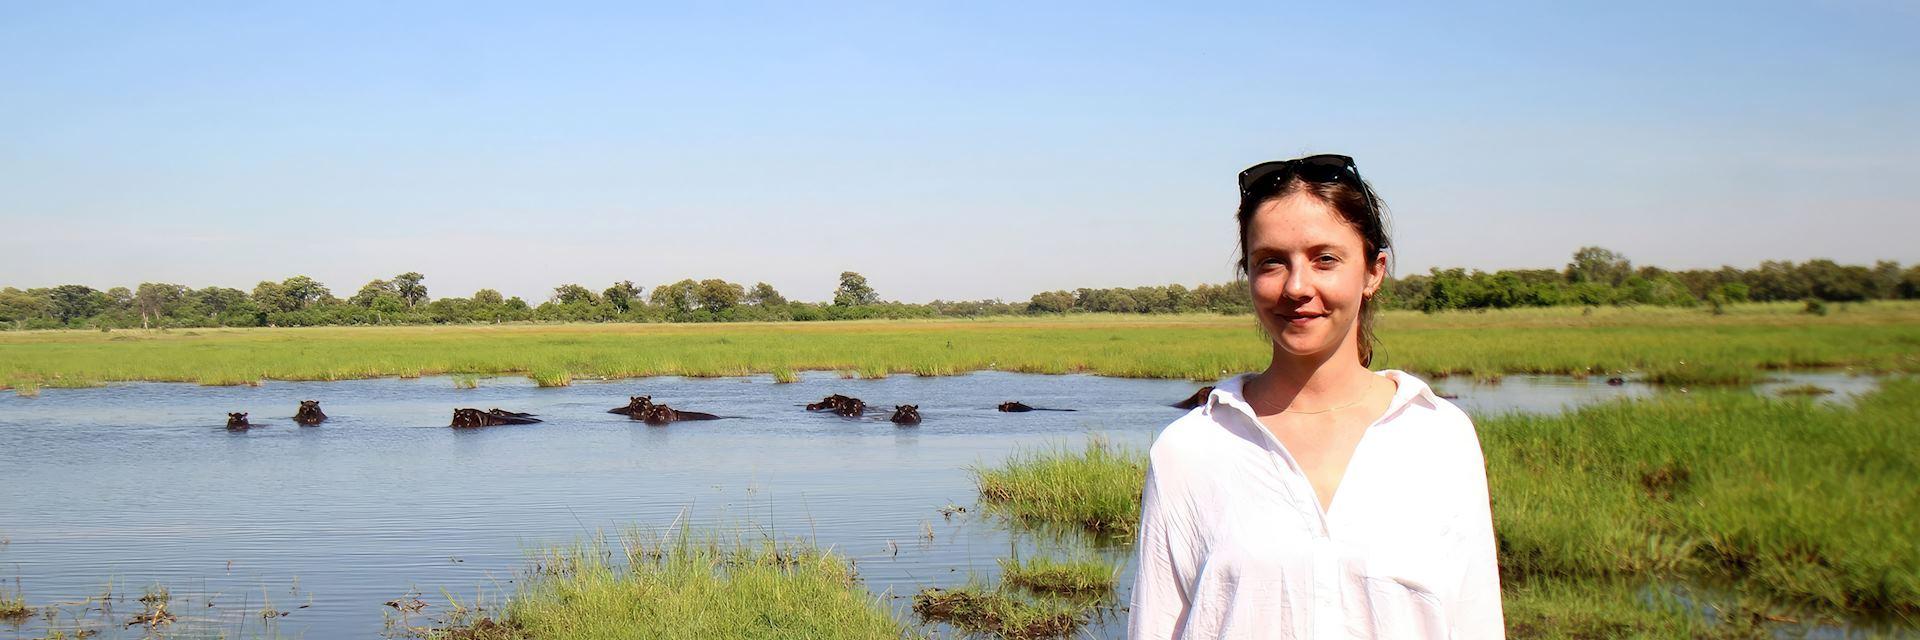 Georgie in Botswana